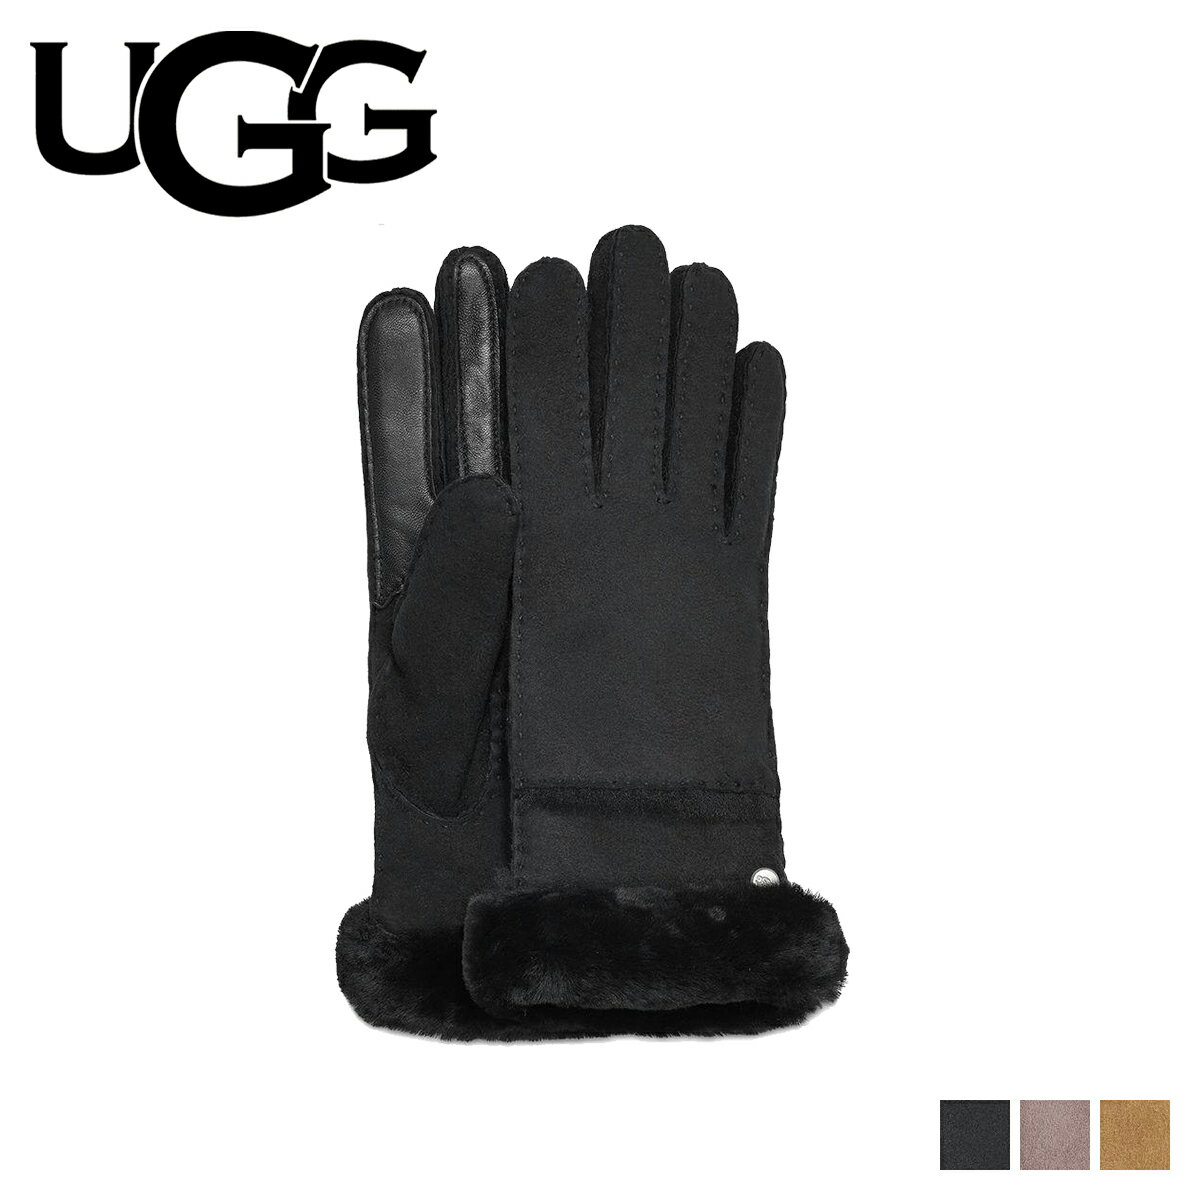 UGG アグ 手袋 グローブ レディース SEAMED TECH GLOVE スマホ対応 ブラック グレー ブラウン 17371BX